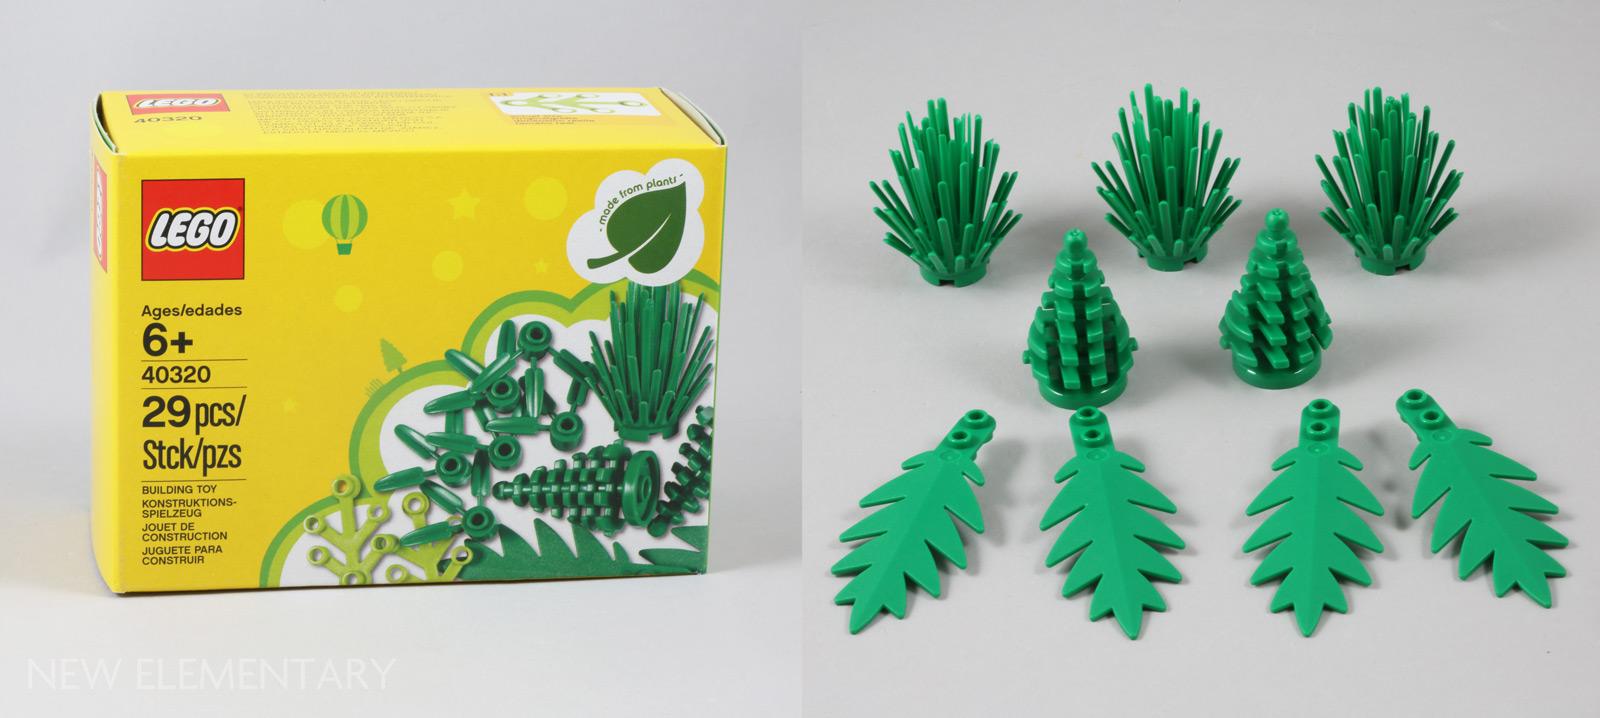 40320 lego plants